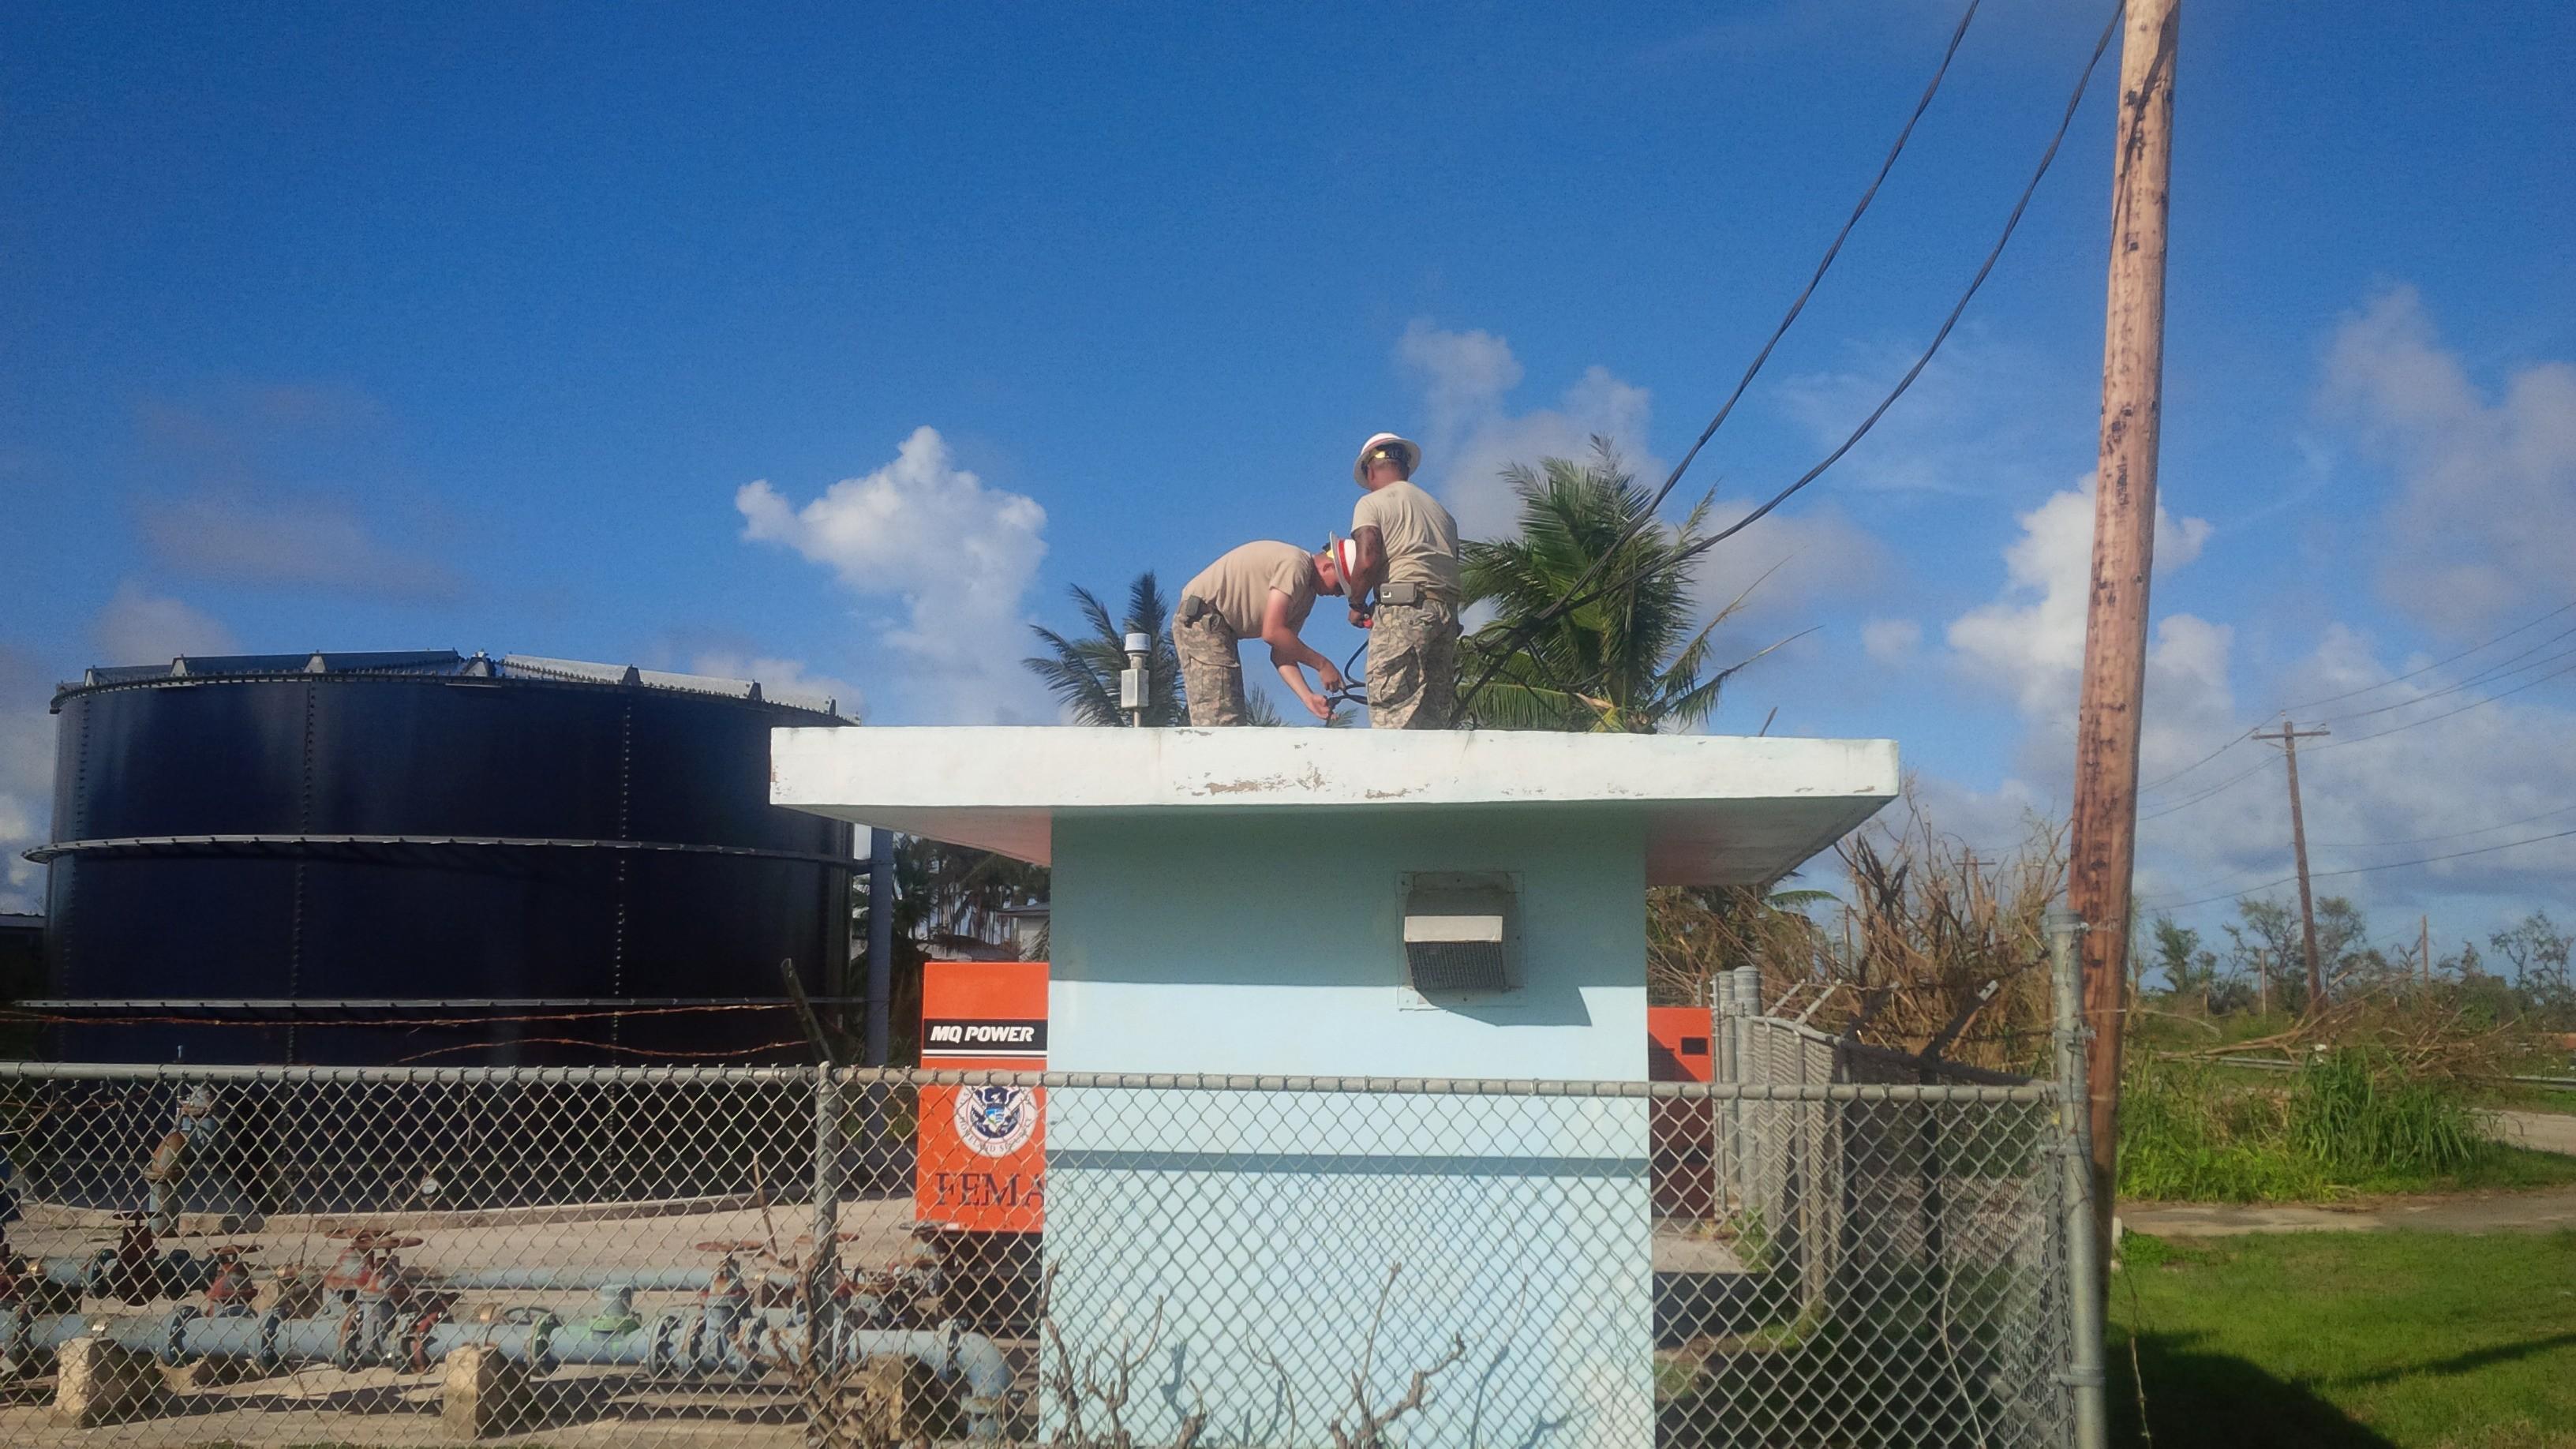 Delta pany power restoration of electricity on Saipan